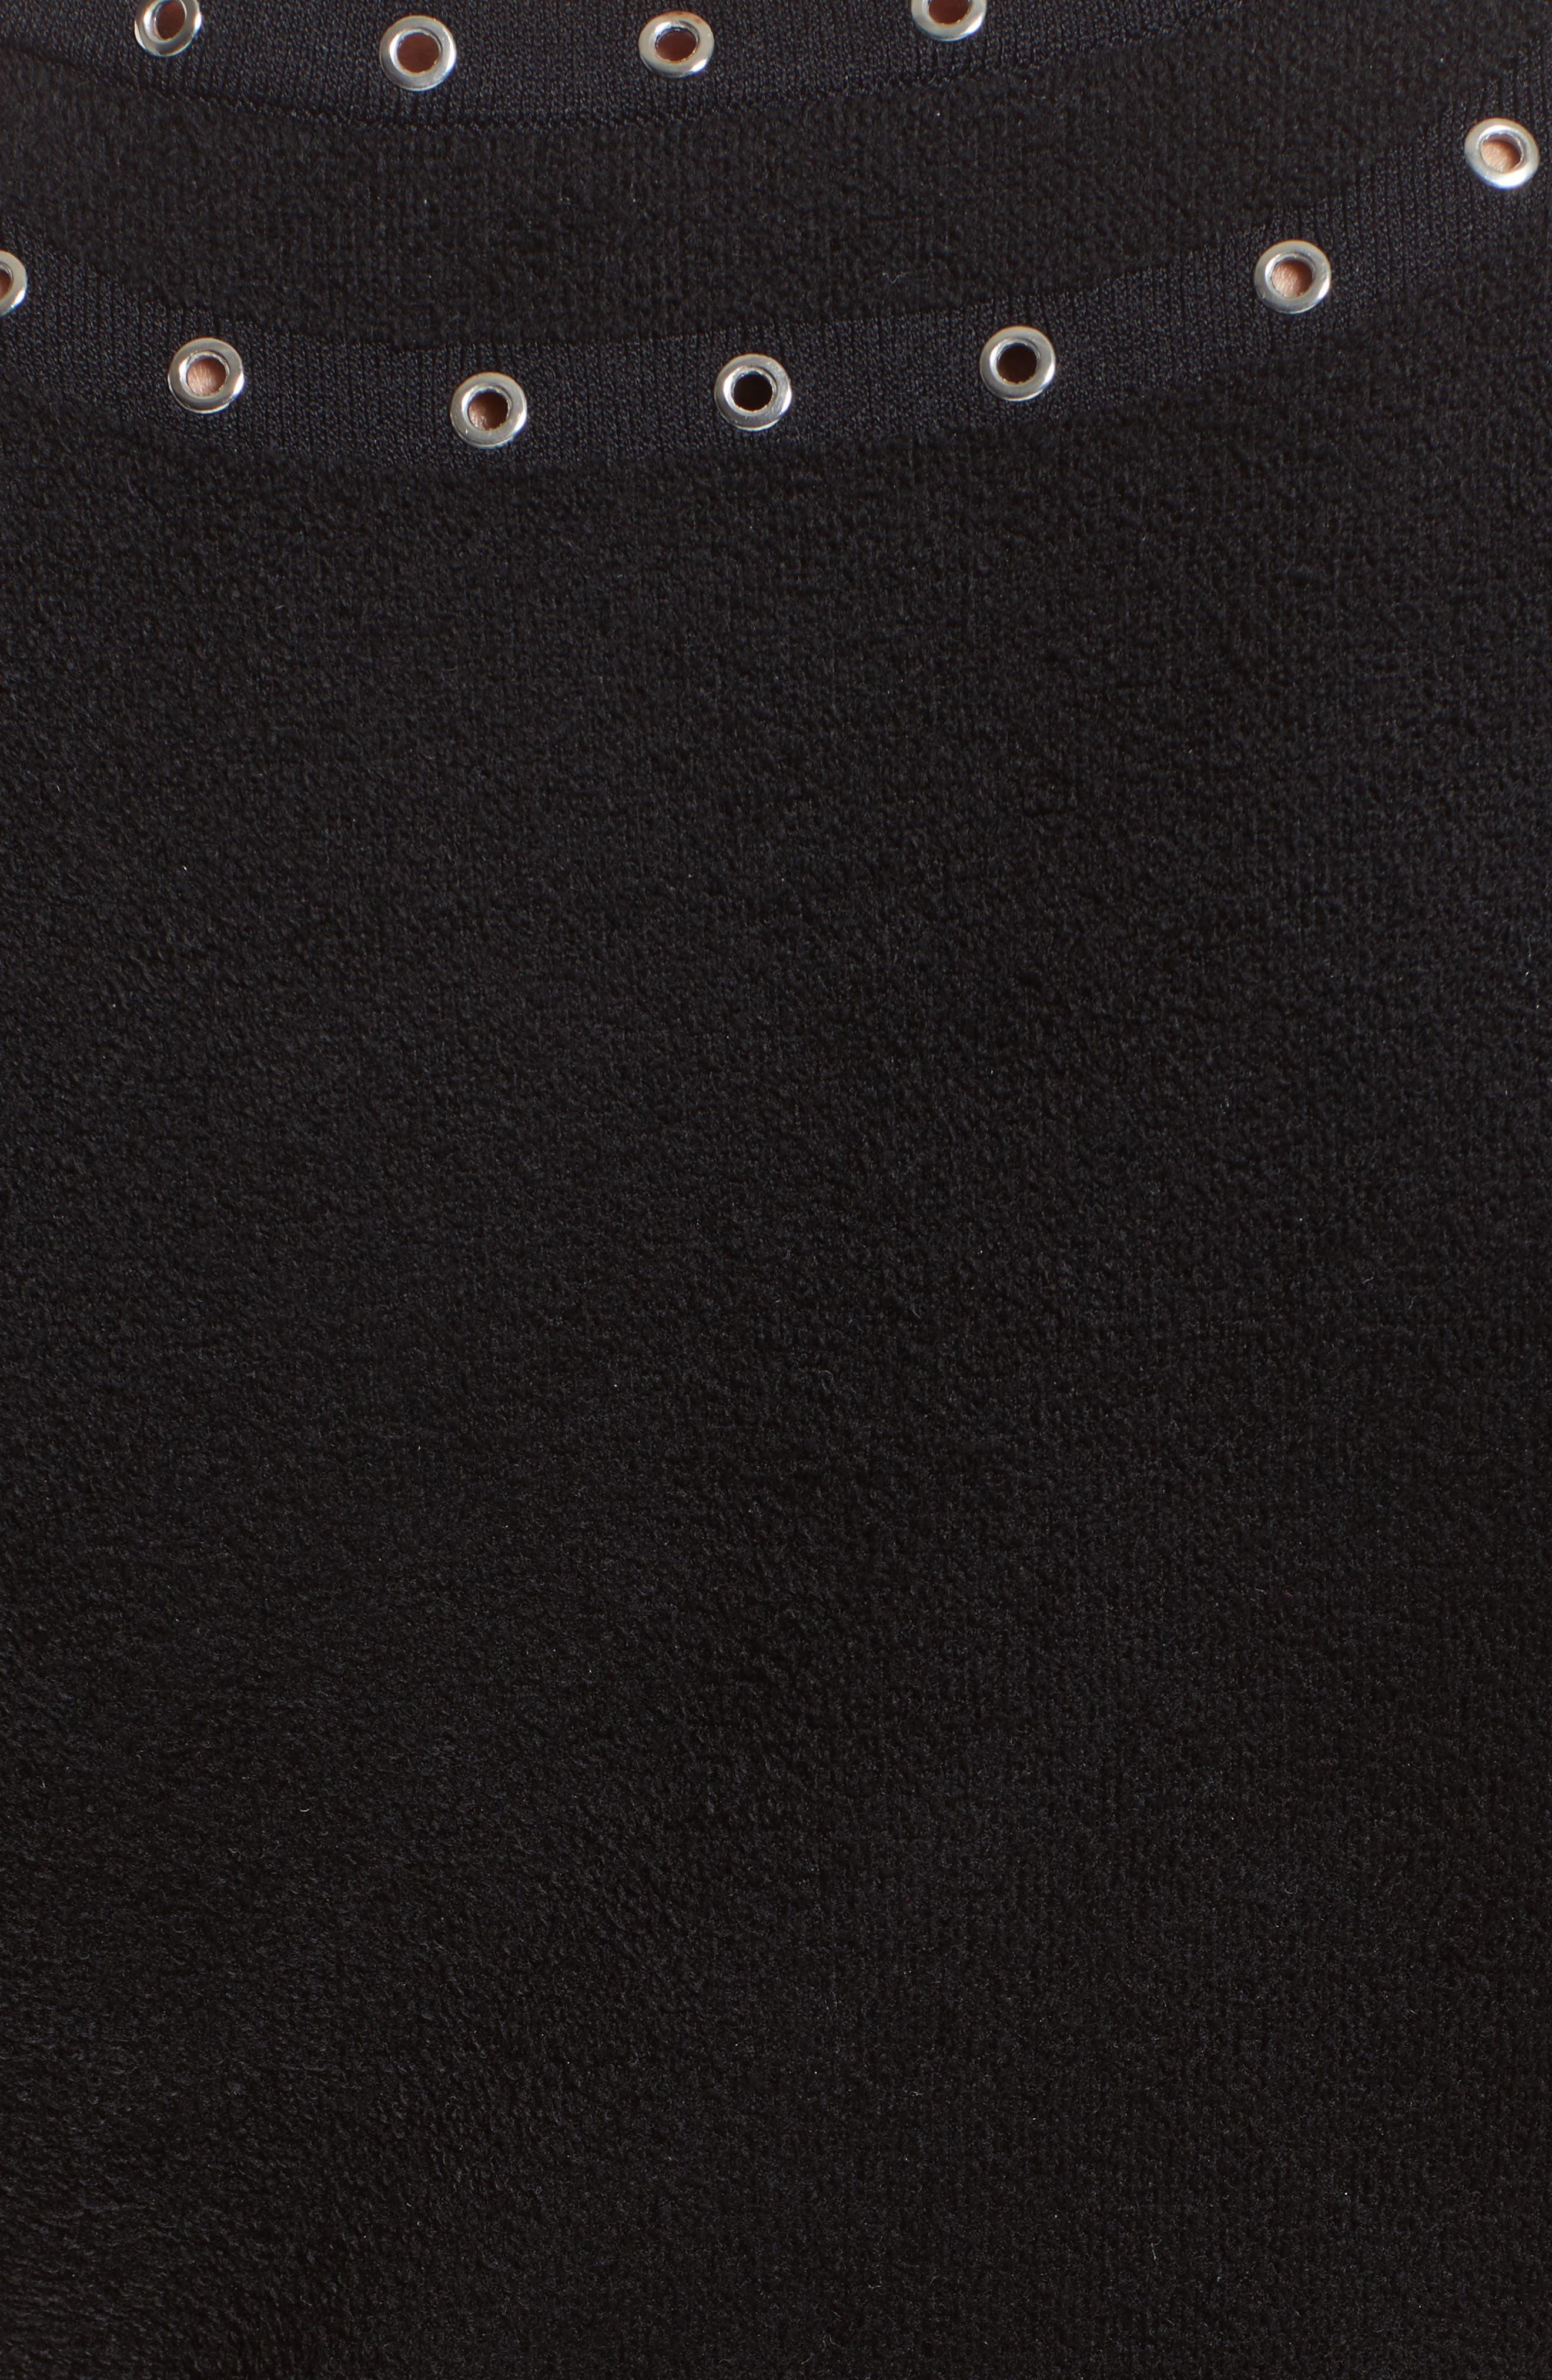 Eyelet Detail Knit Dress,                             Alternate thumbnail 6, color,                             001